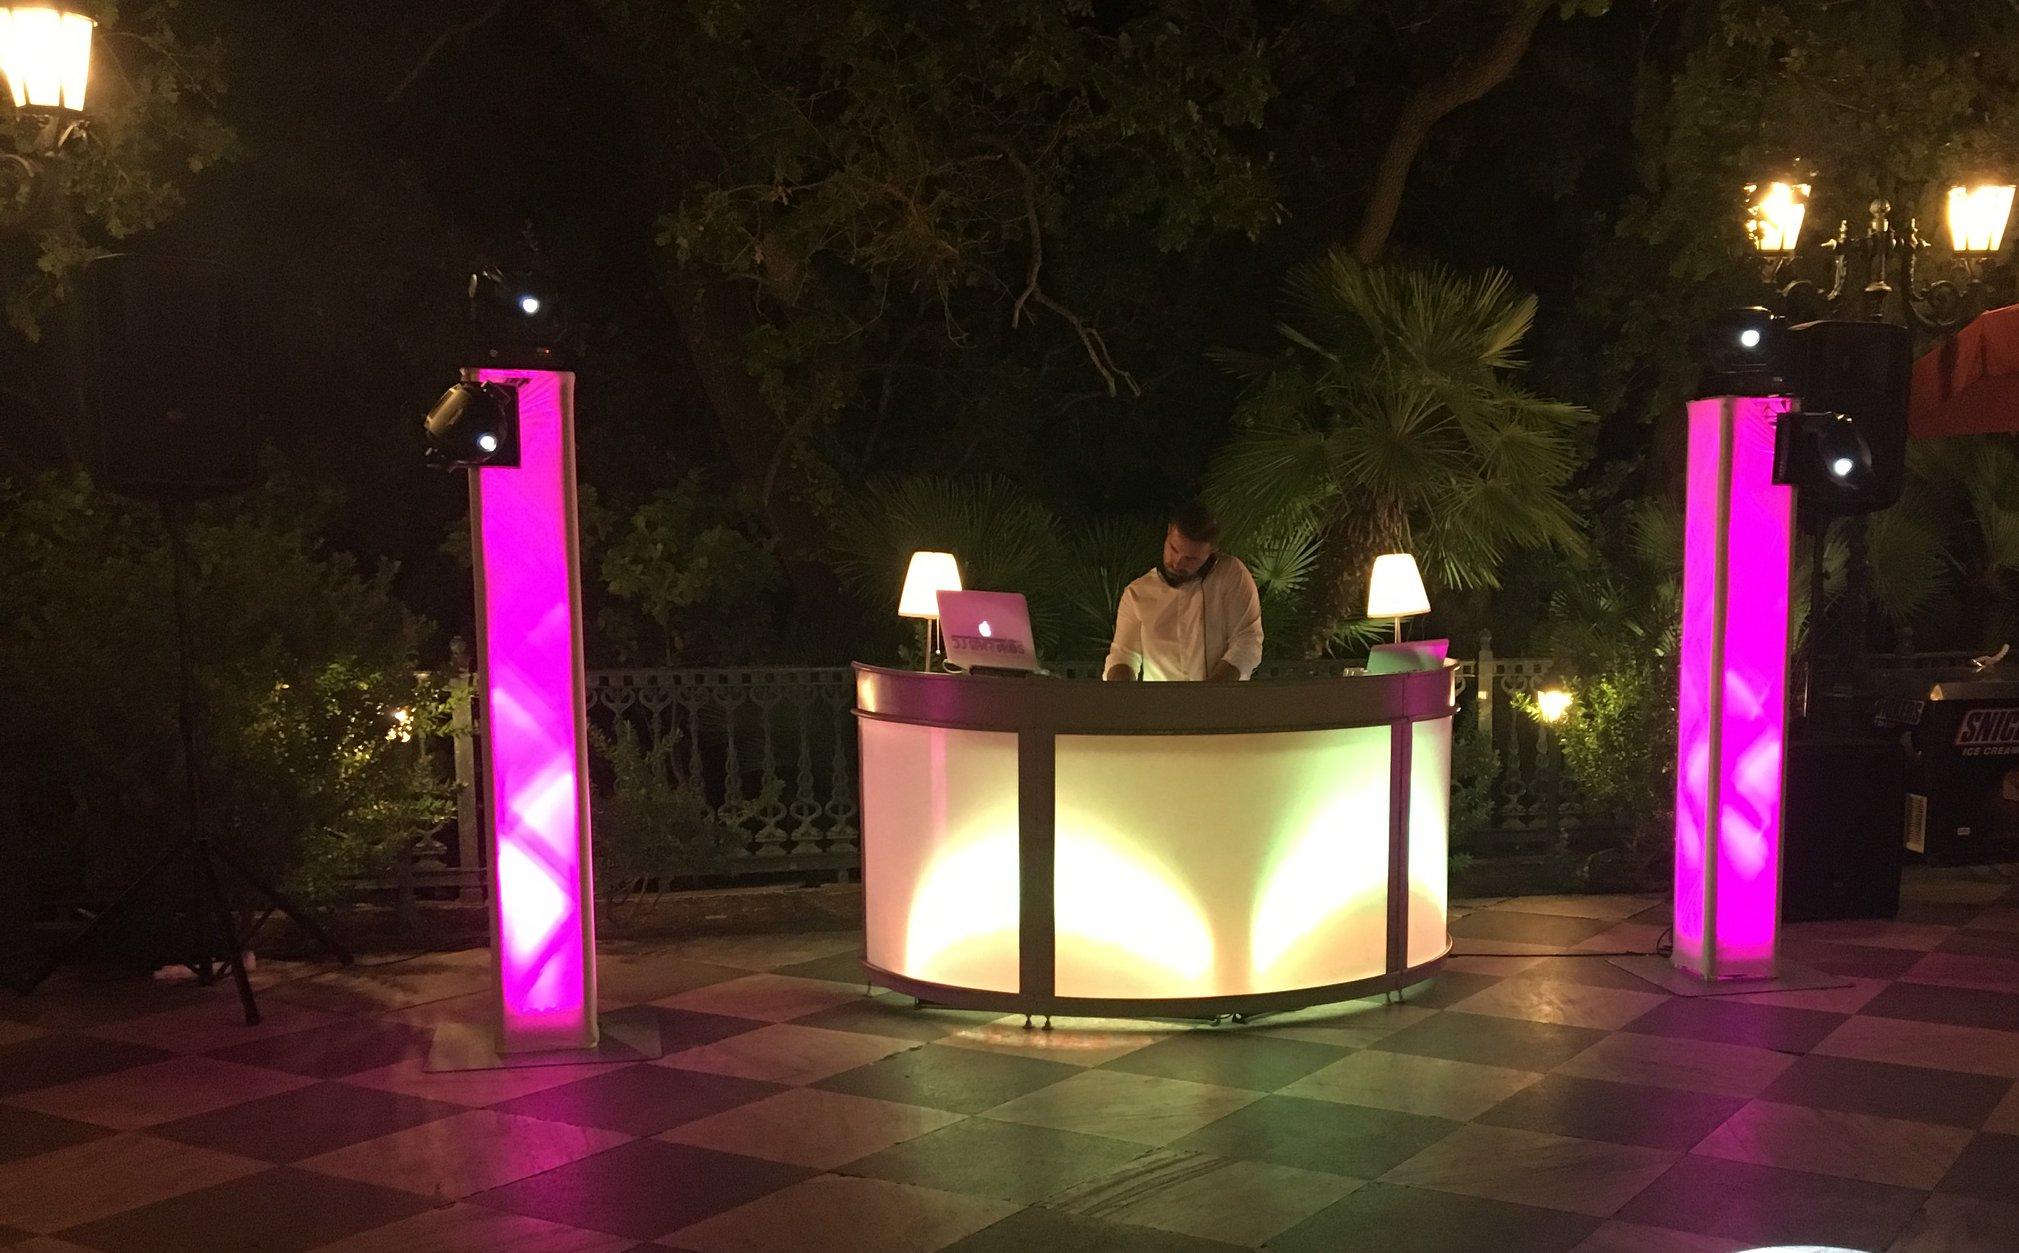 #corfuisland #corfugreece #corfudj #corfudjs #luxurydj #luxuryweddingdj #dj #djing #djequipment #djismylife #djspartakos #wedding #weddinginspiration #weddingdj #weddingplanners #corfuweddingplanner #corfuwedding #corfuweddings #weddingincorfu #luxuryweddingcakes #luxurywedding #luxury_dj_events #lux #luxury #events #music #passion #party